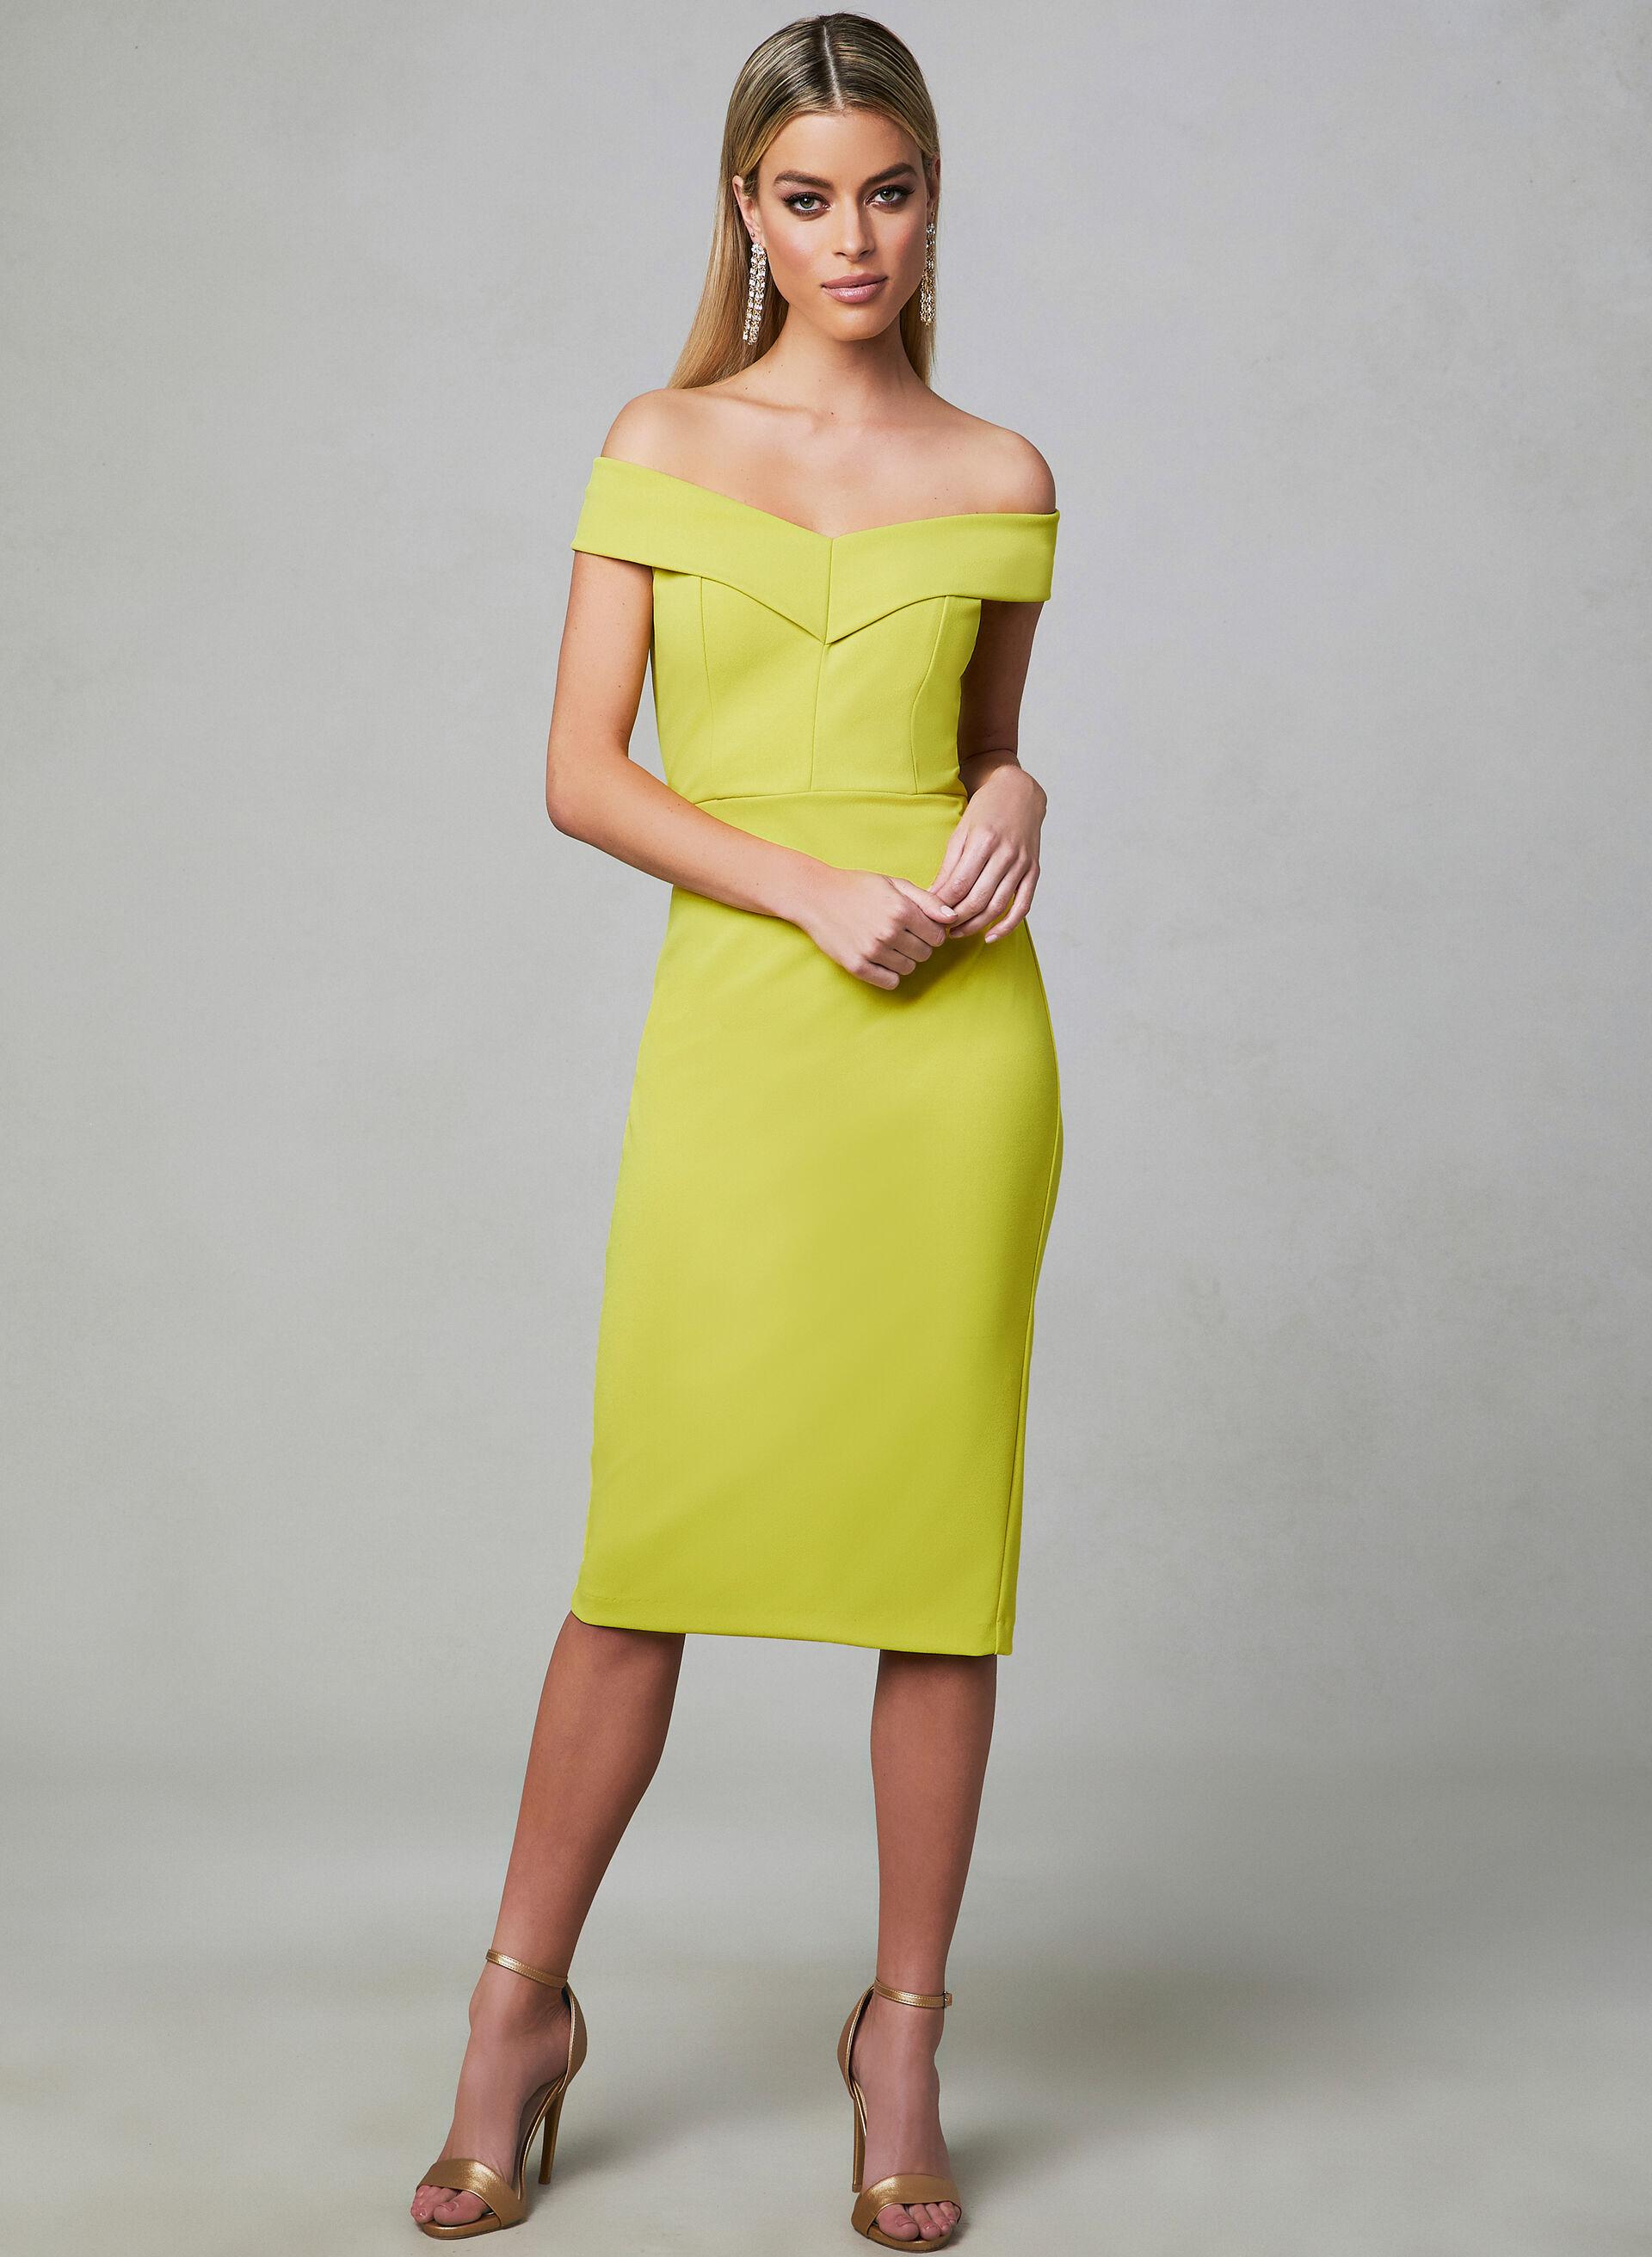 Vente de robe de soiree occasion